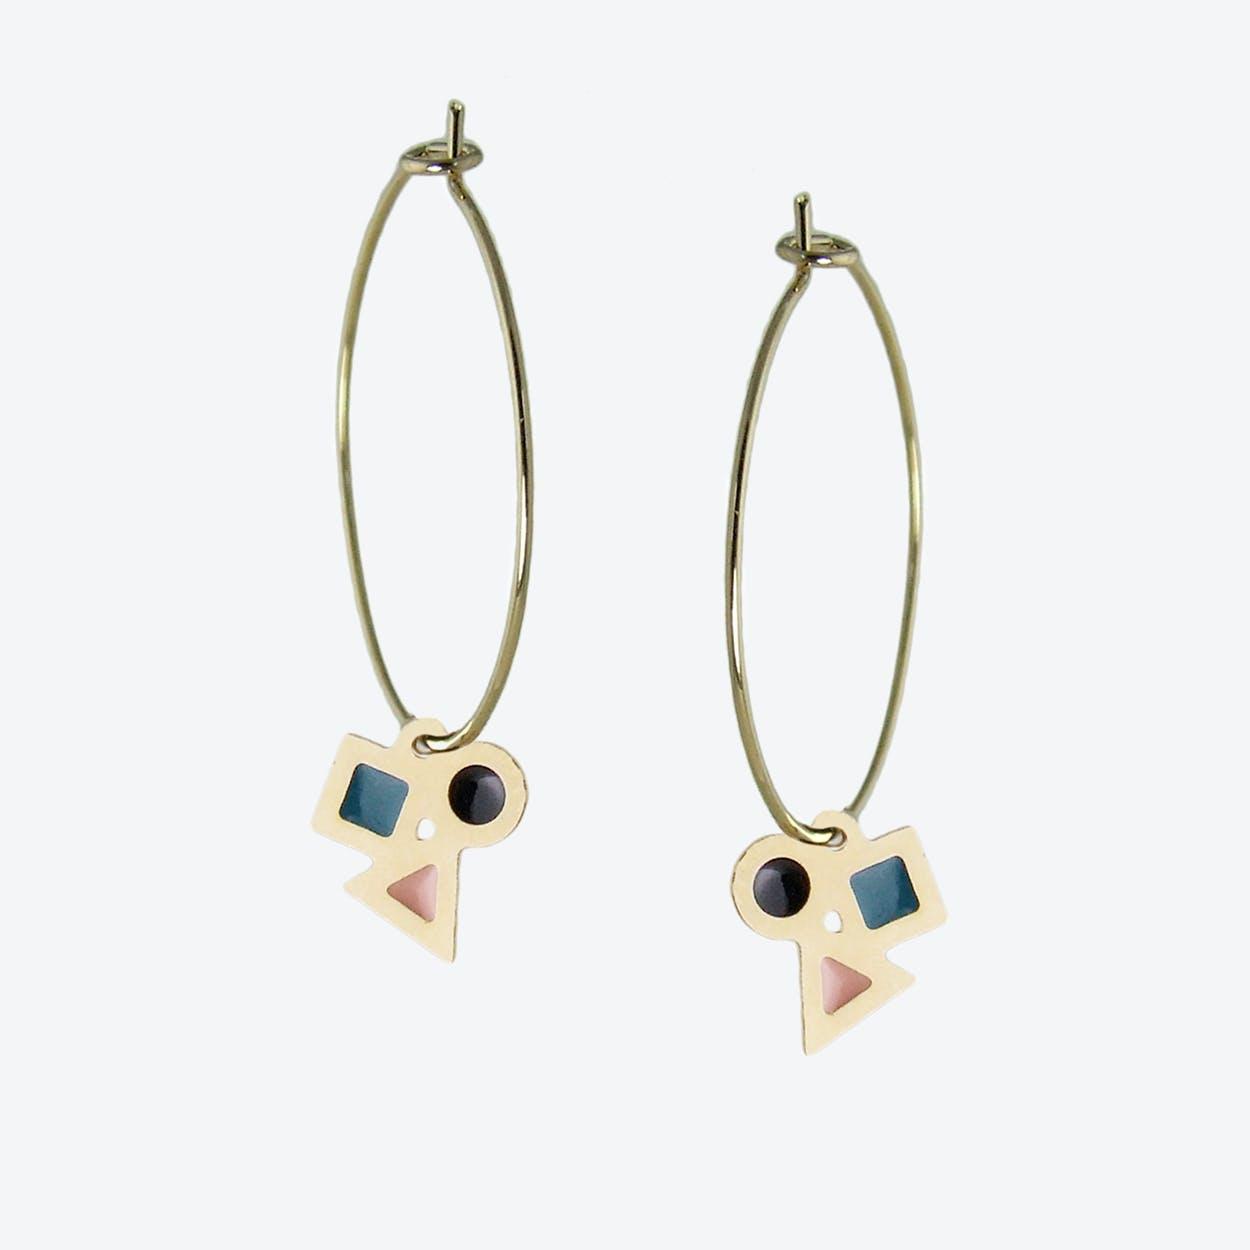 Delicate Geometric Hoop Earrings in Black, Blush Pink, and Emerald